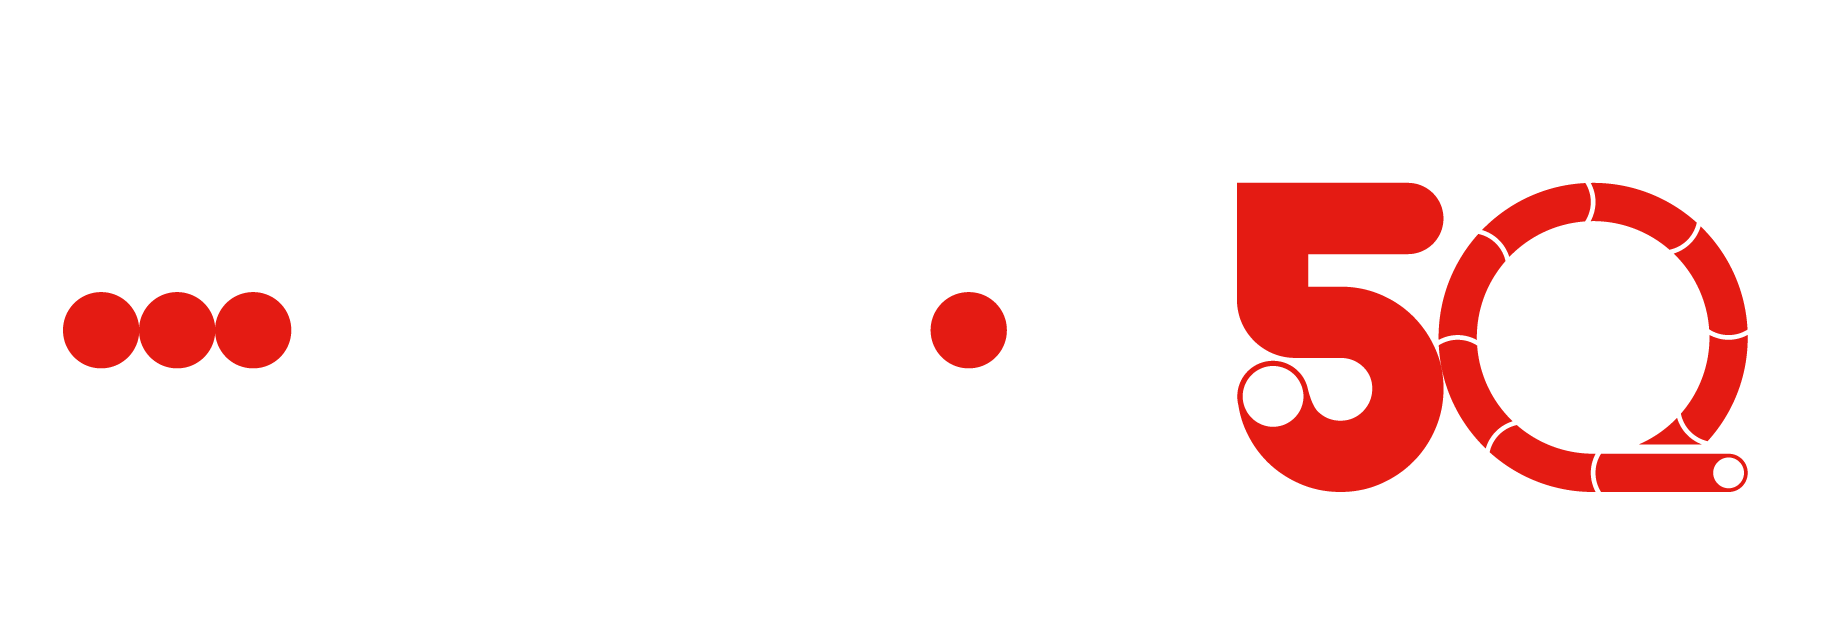 Tienda virtual Outlet Grupo RHC